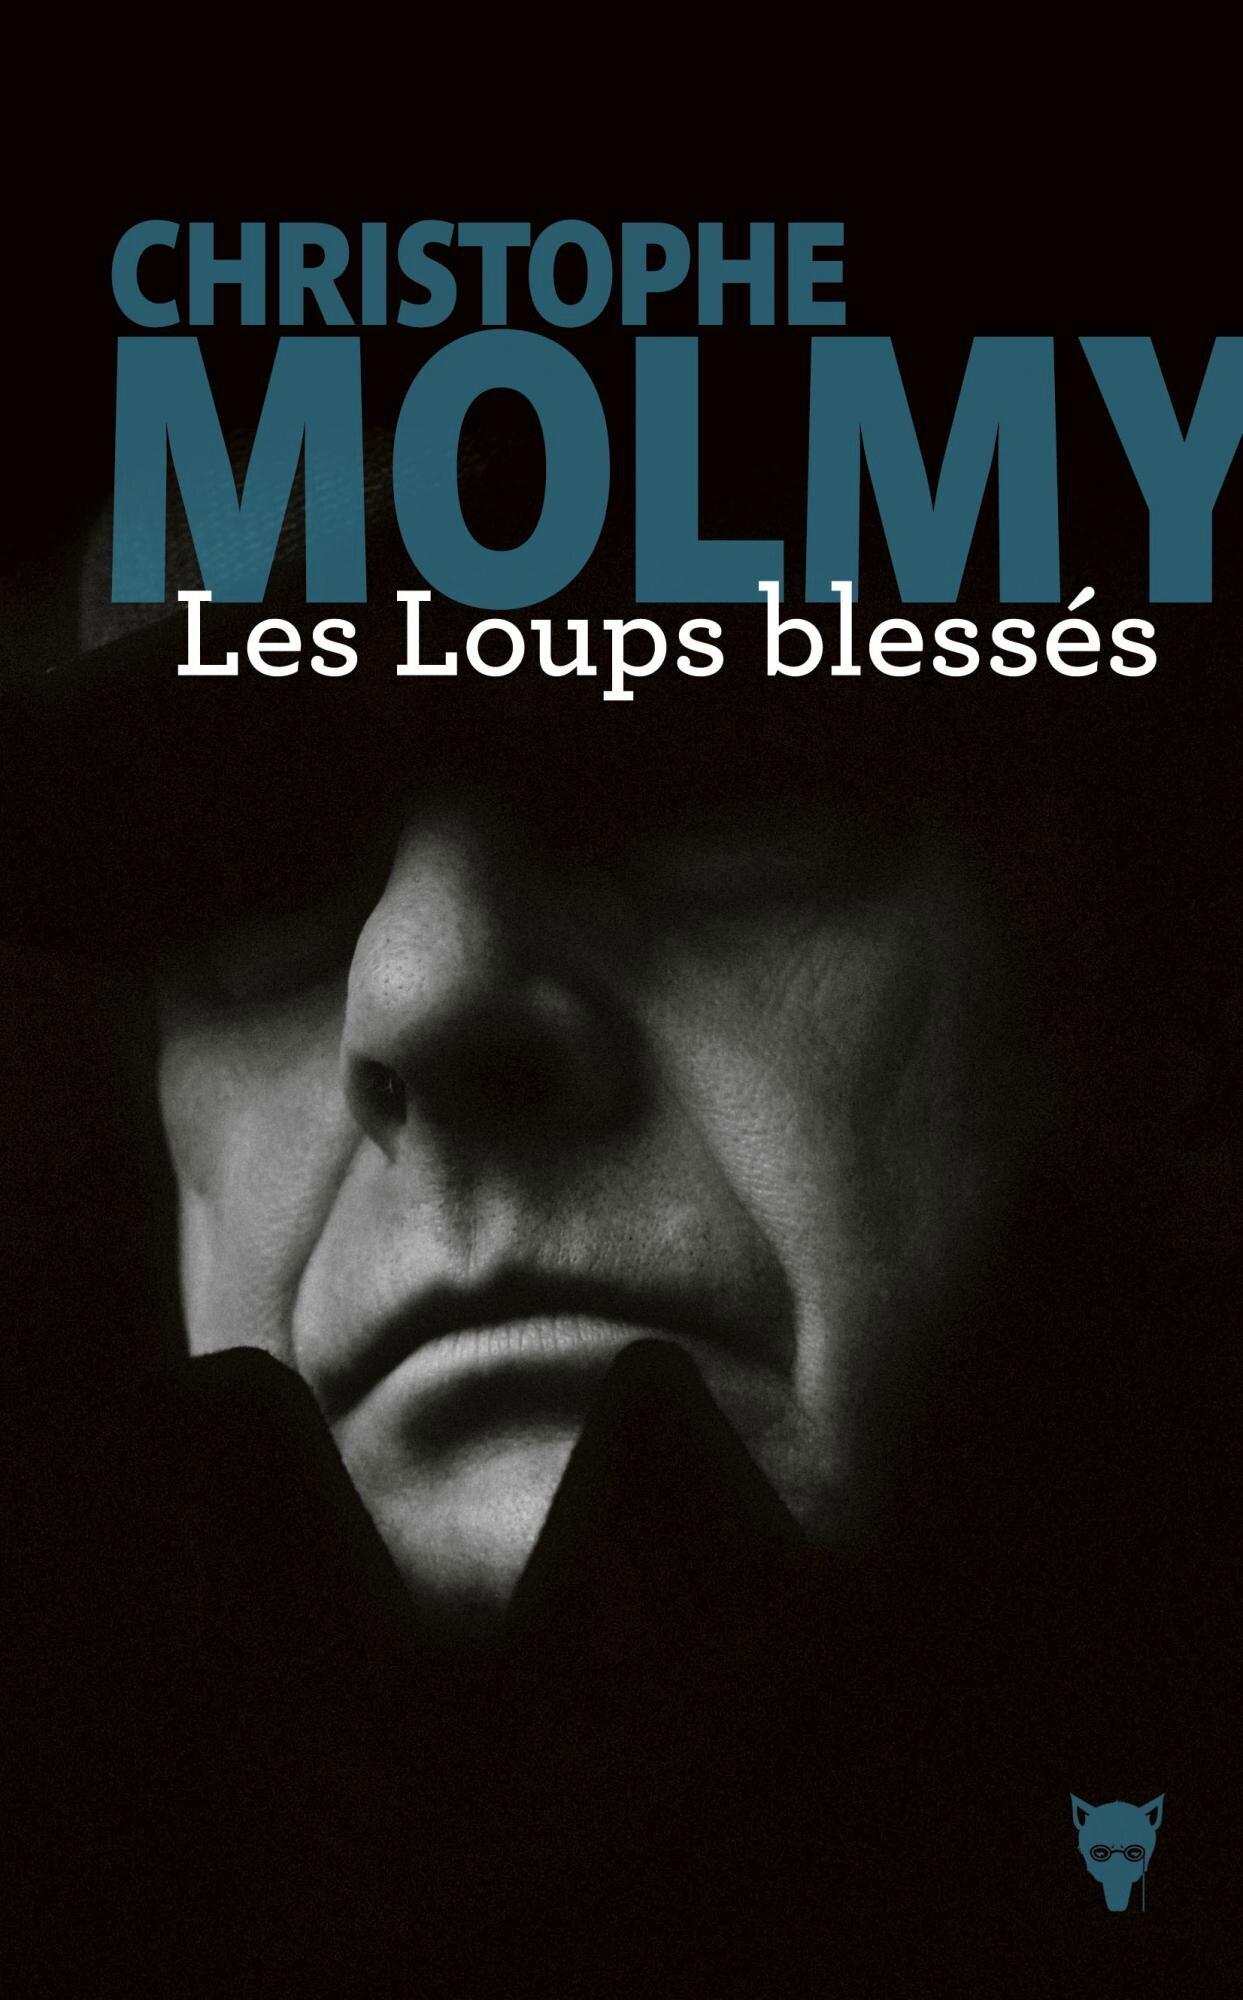 LES LOUPS BLESSÉS - Christophe MOLMY